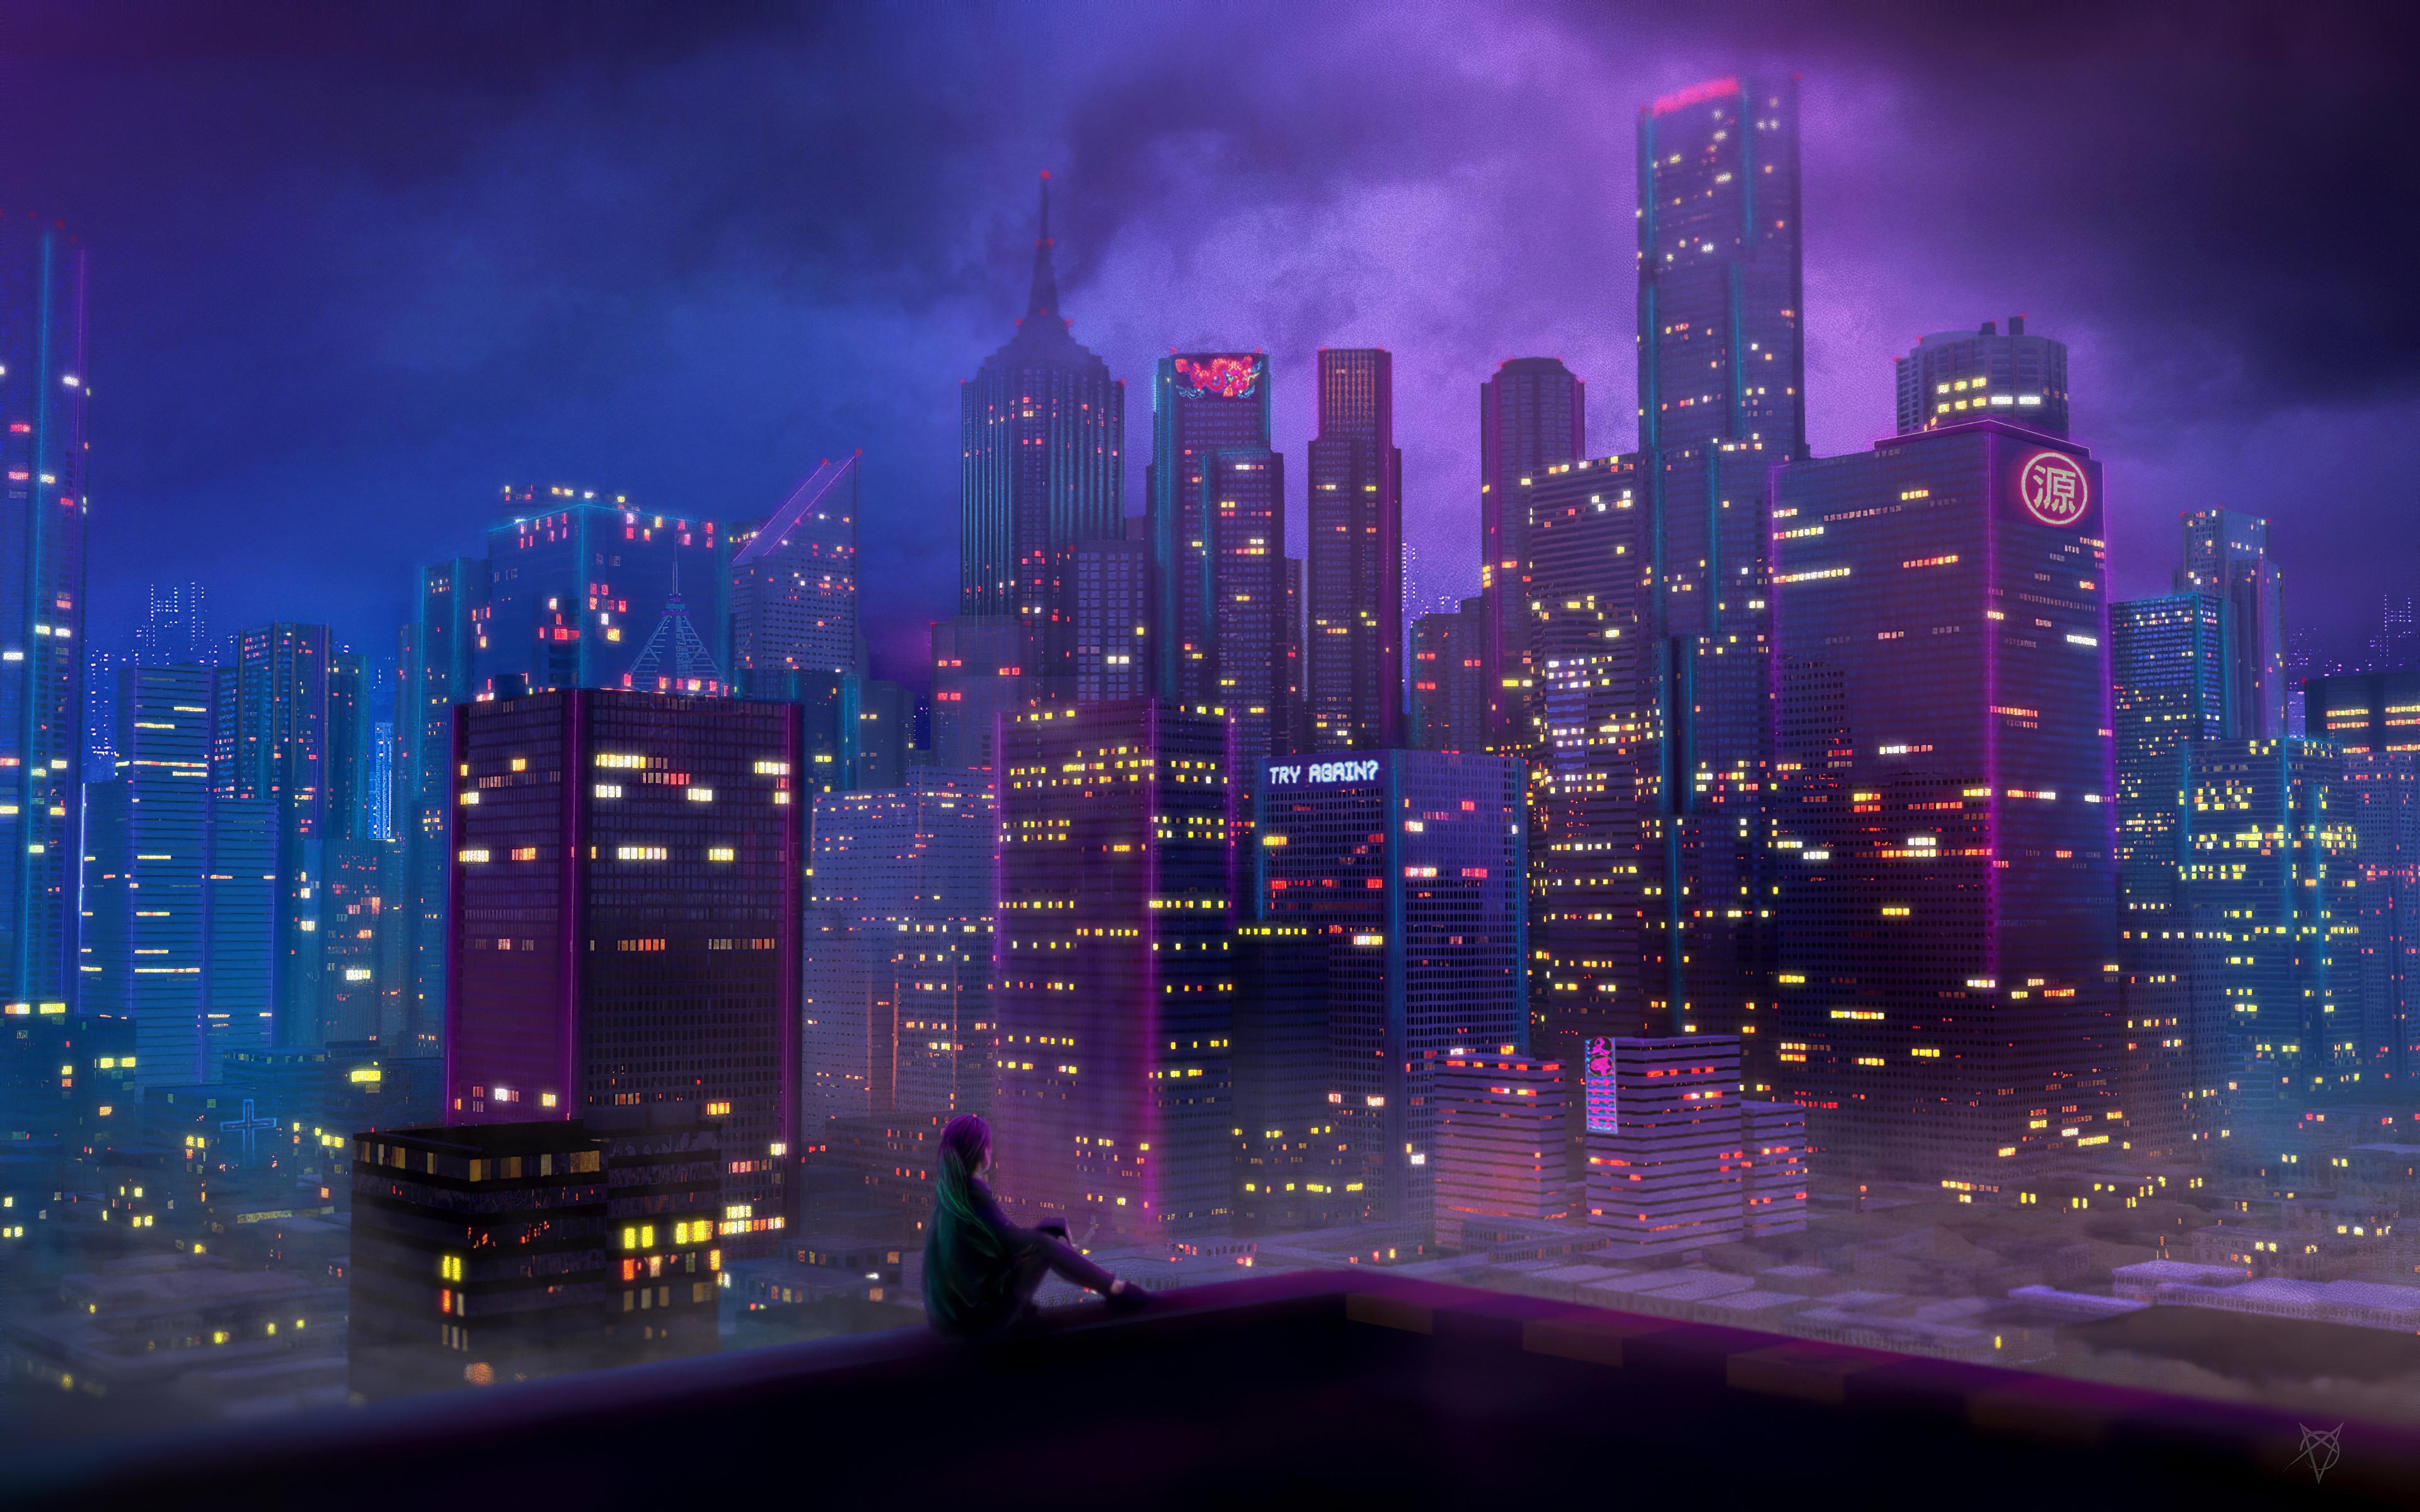 anime city girl 1578254395 - Anime City Girl -